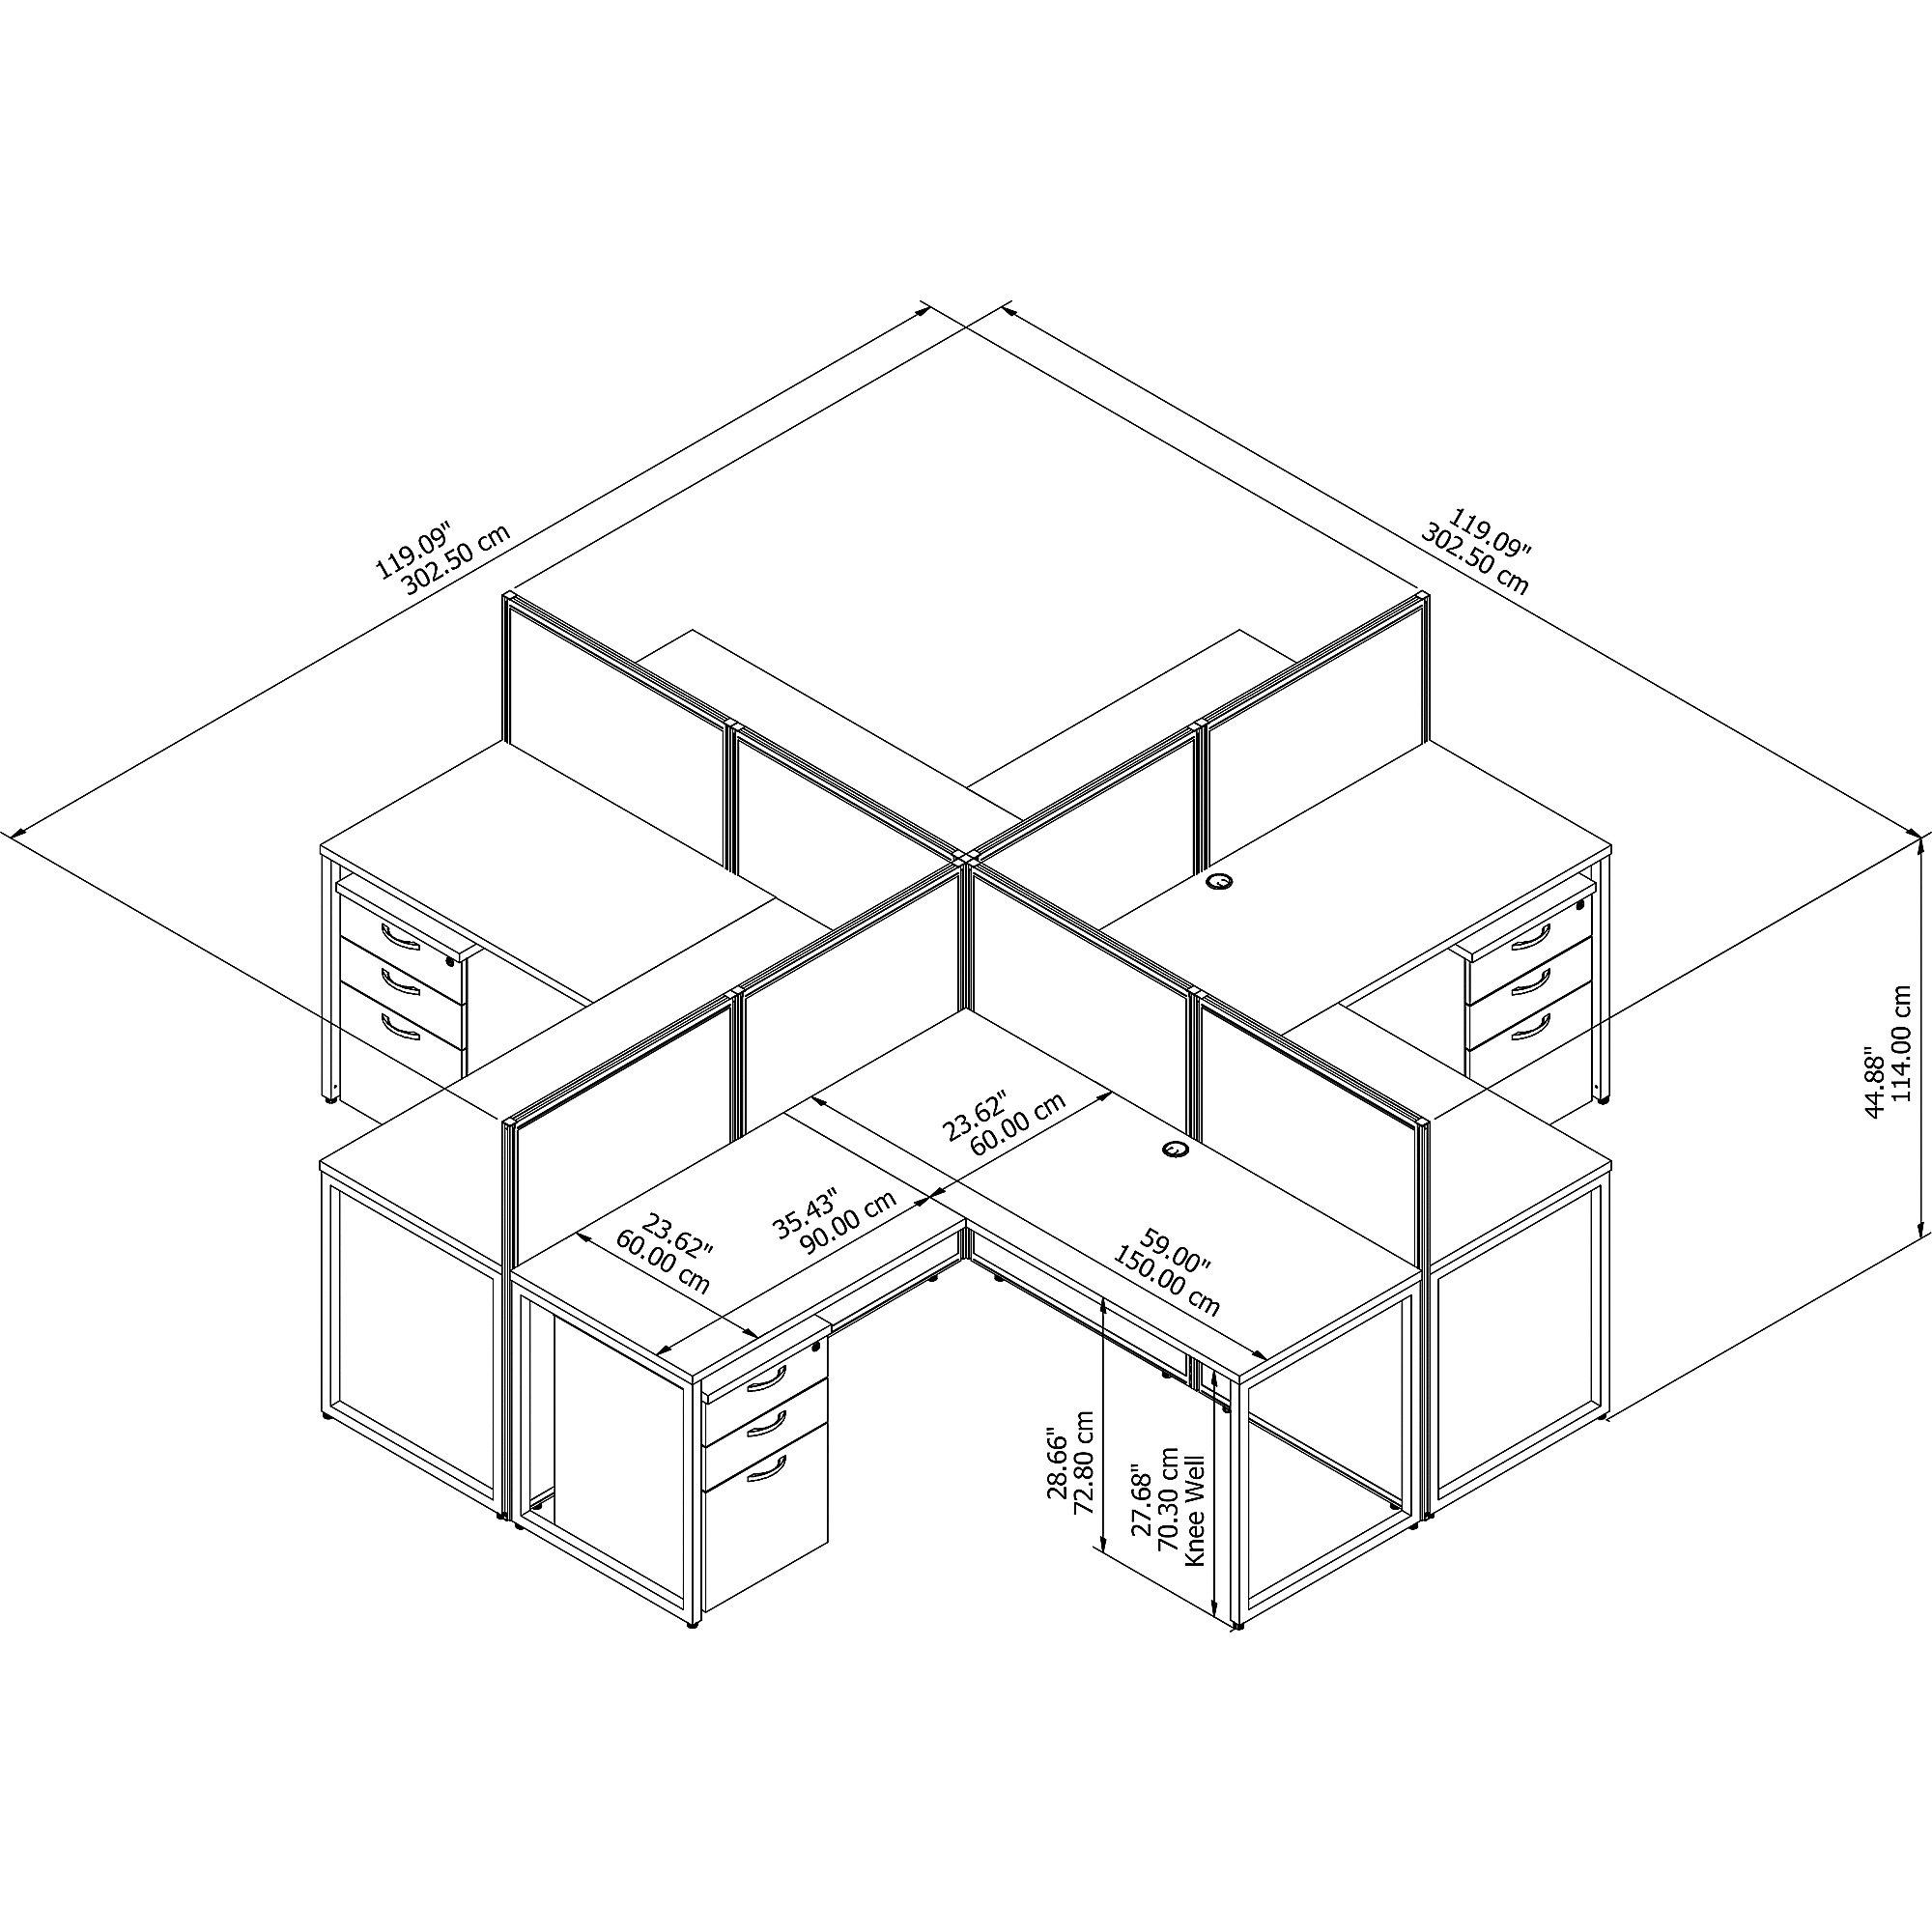 white 4 person modular cubicle configuration dimensions